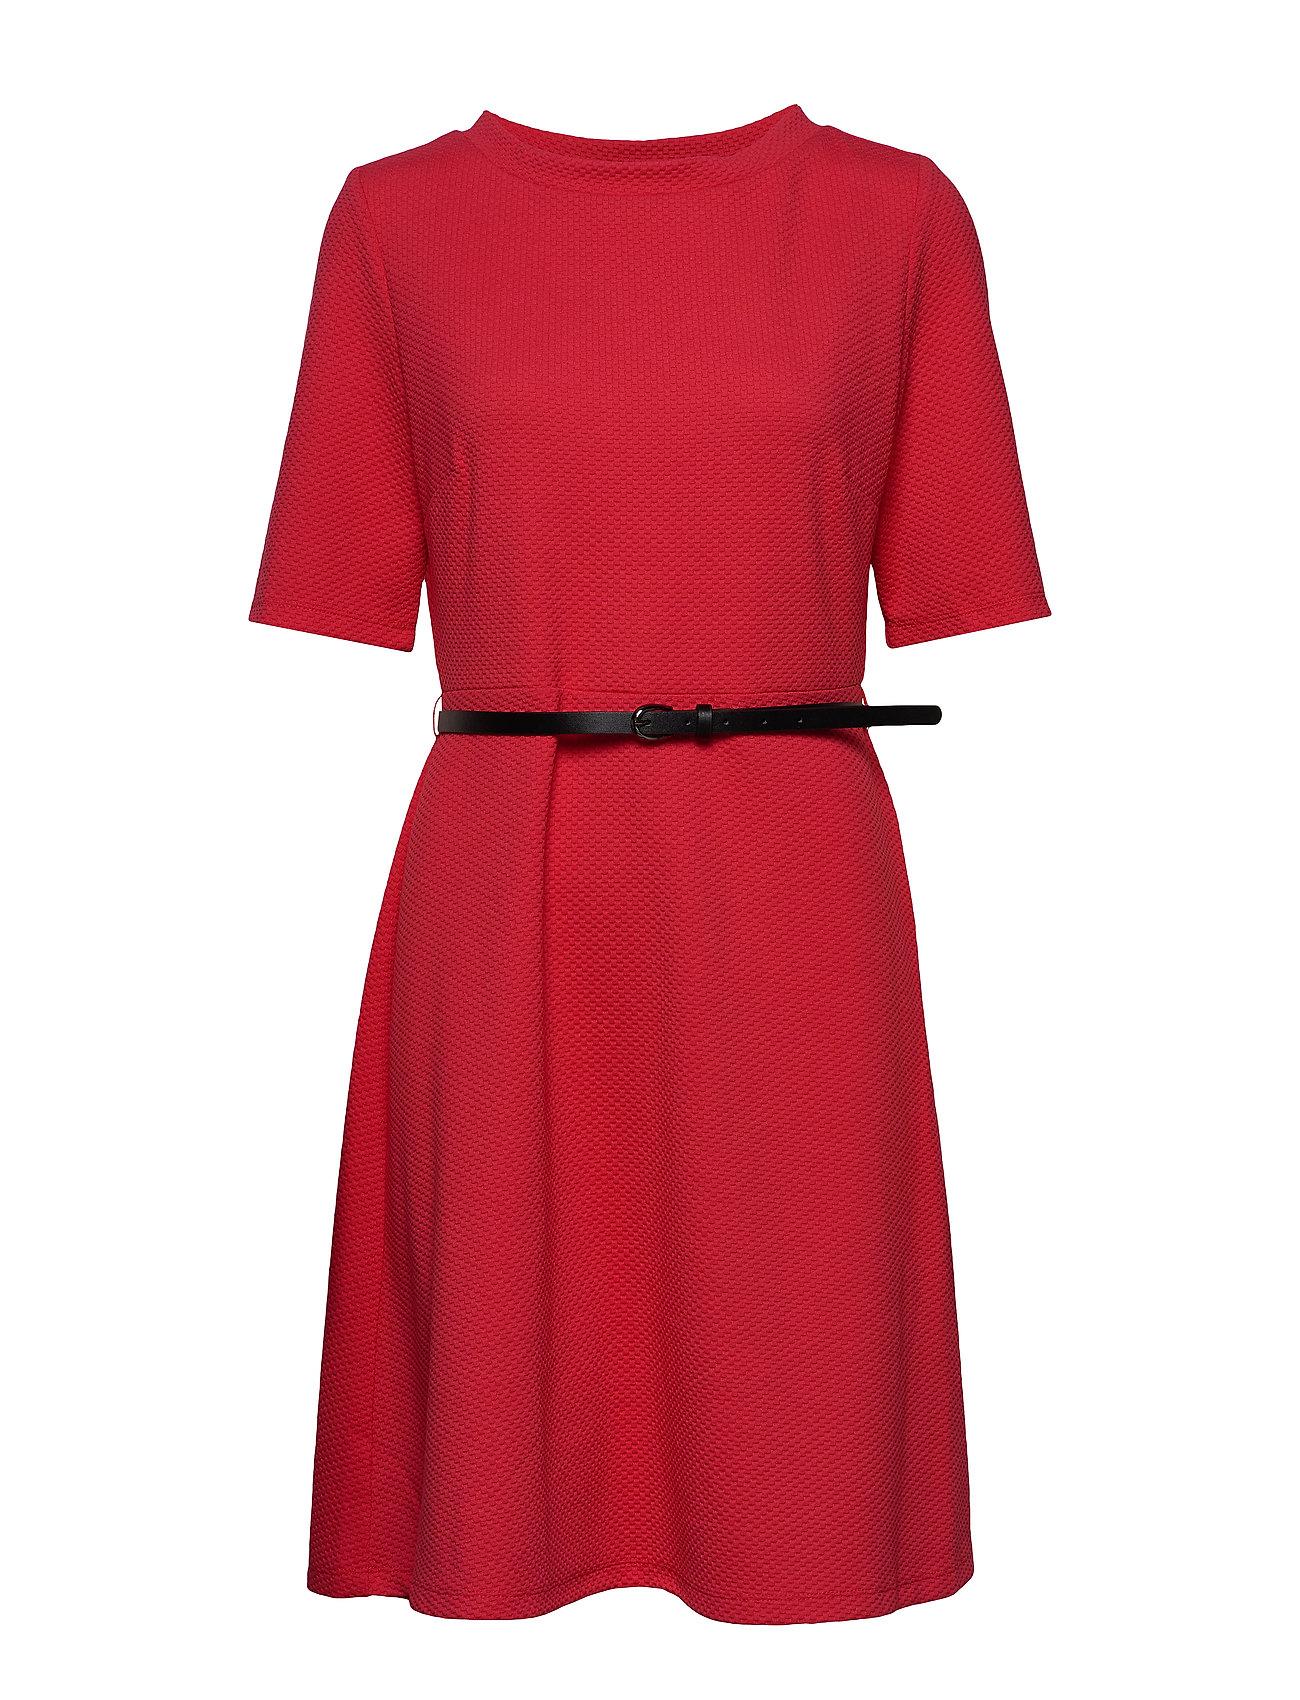 Image of Dress Knitted Fabric Knælang Kjole Rød Taifun (3307692125)